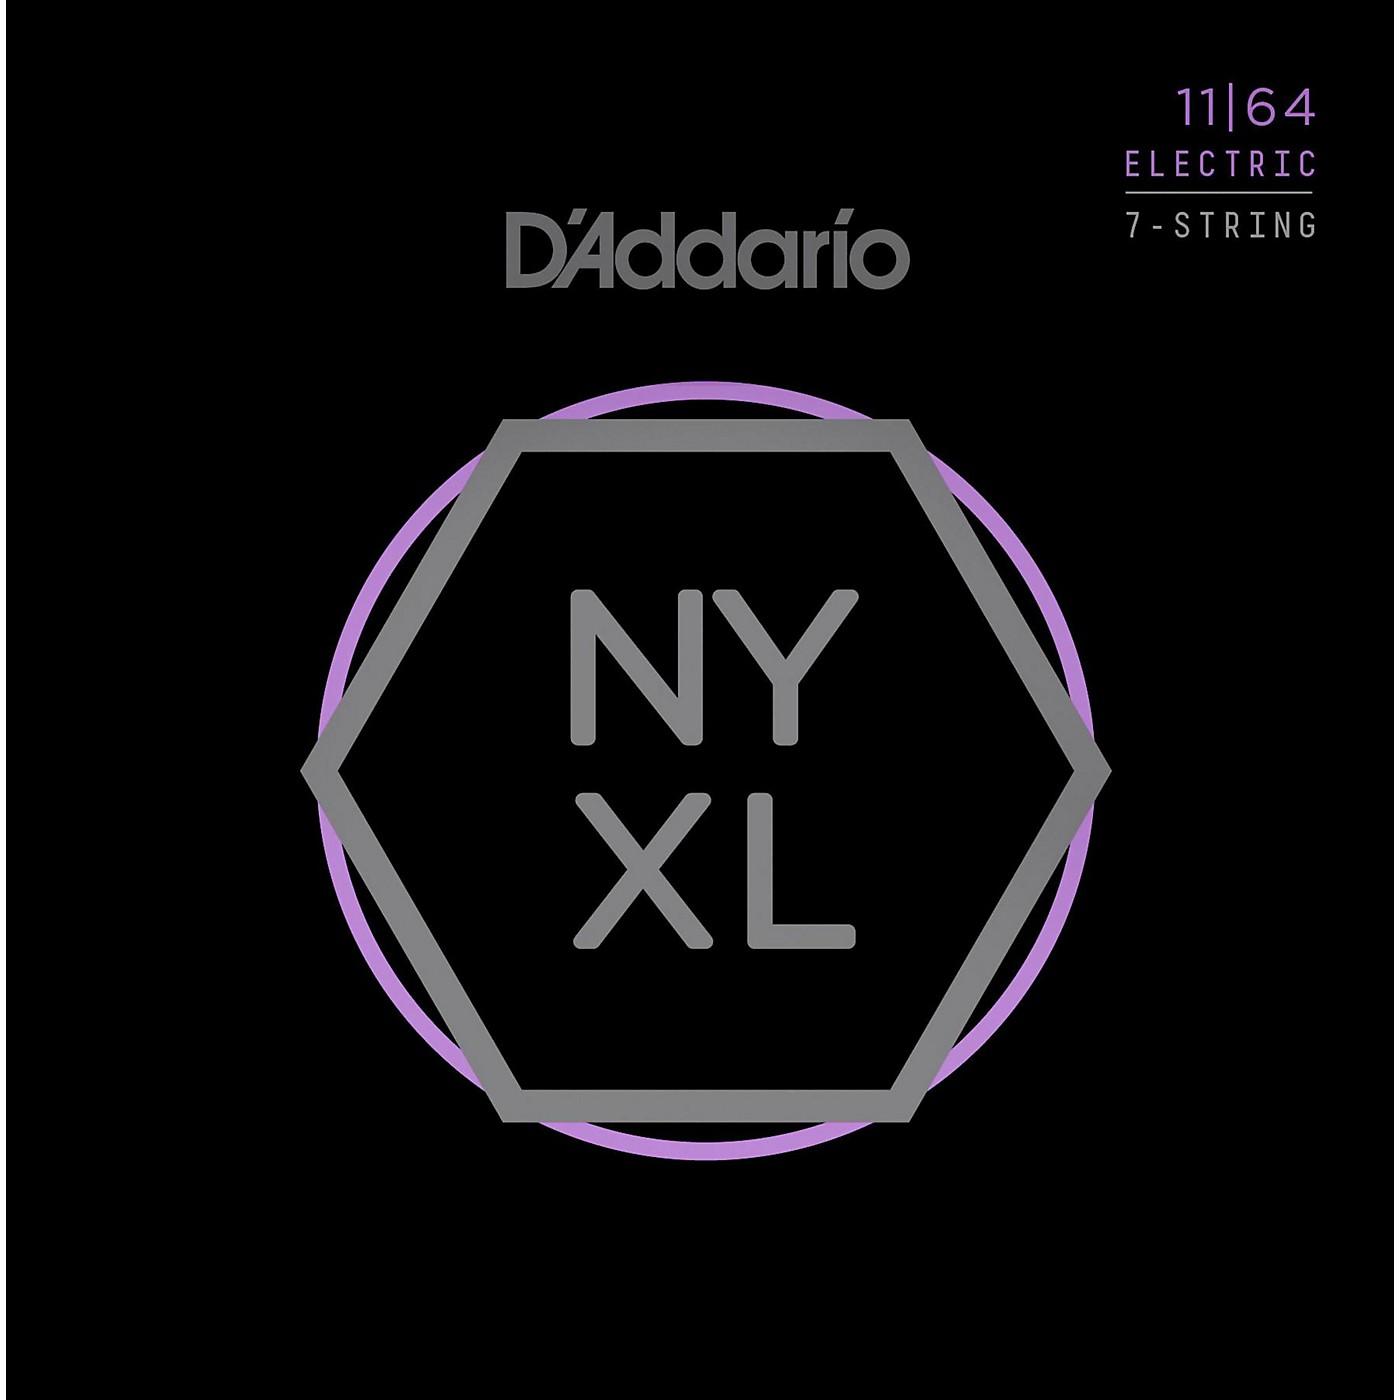 D'Addario NYXL1164 7-String Medium Nickel Wound Electric Guitar Strings (11-64) thumbnail